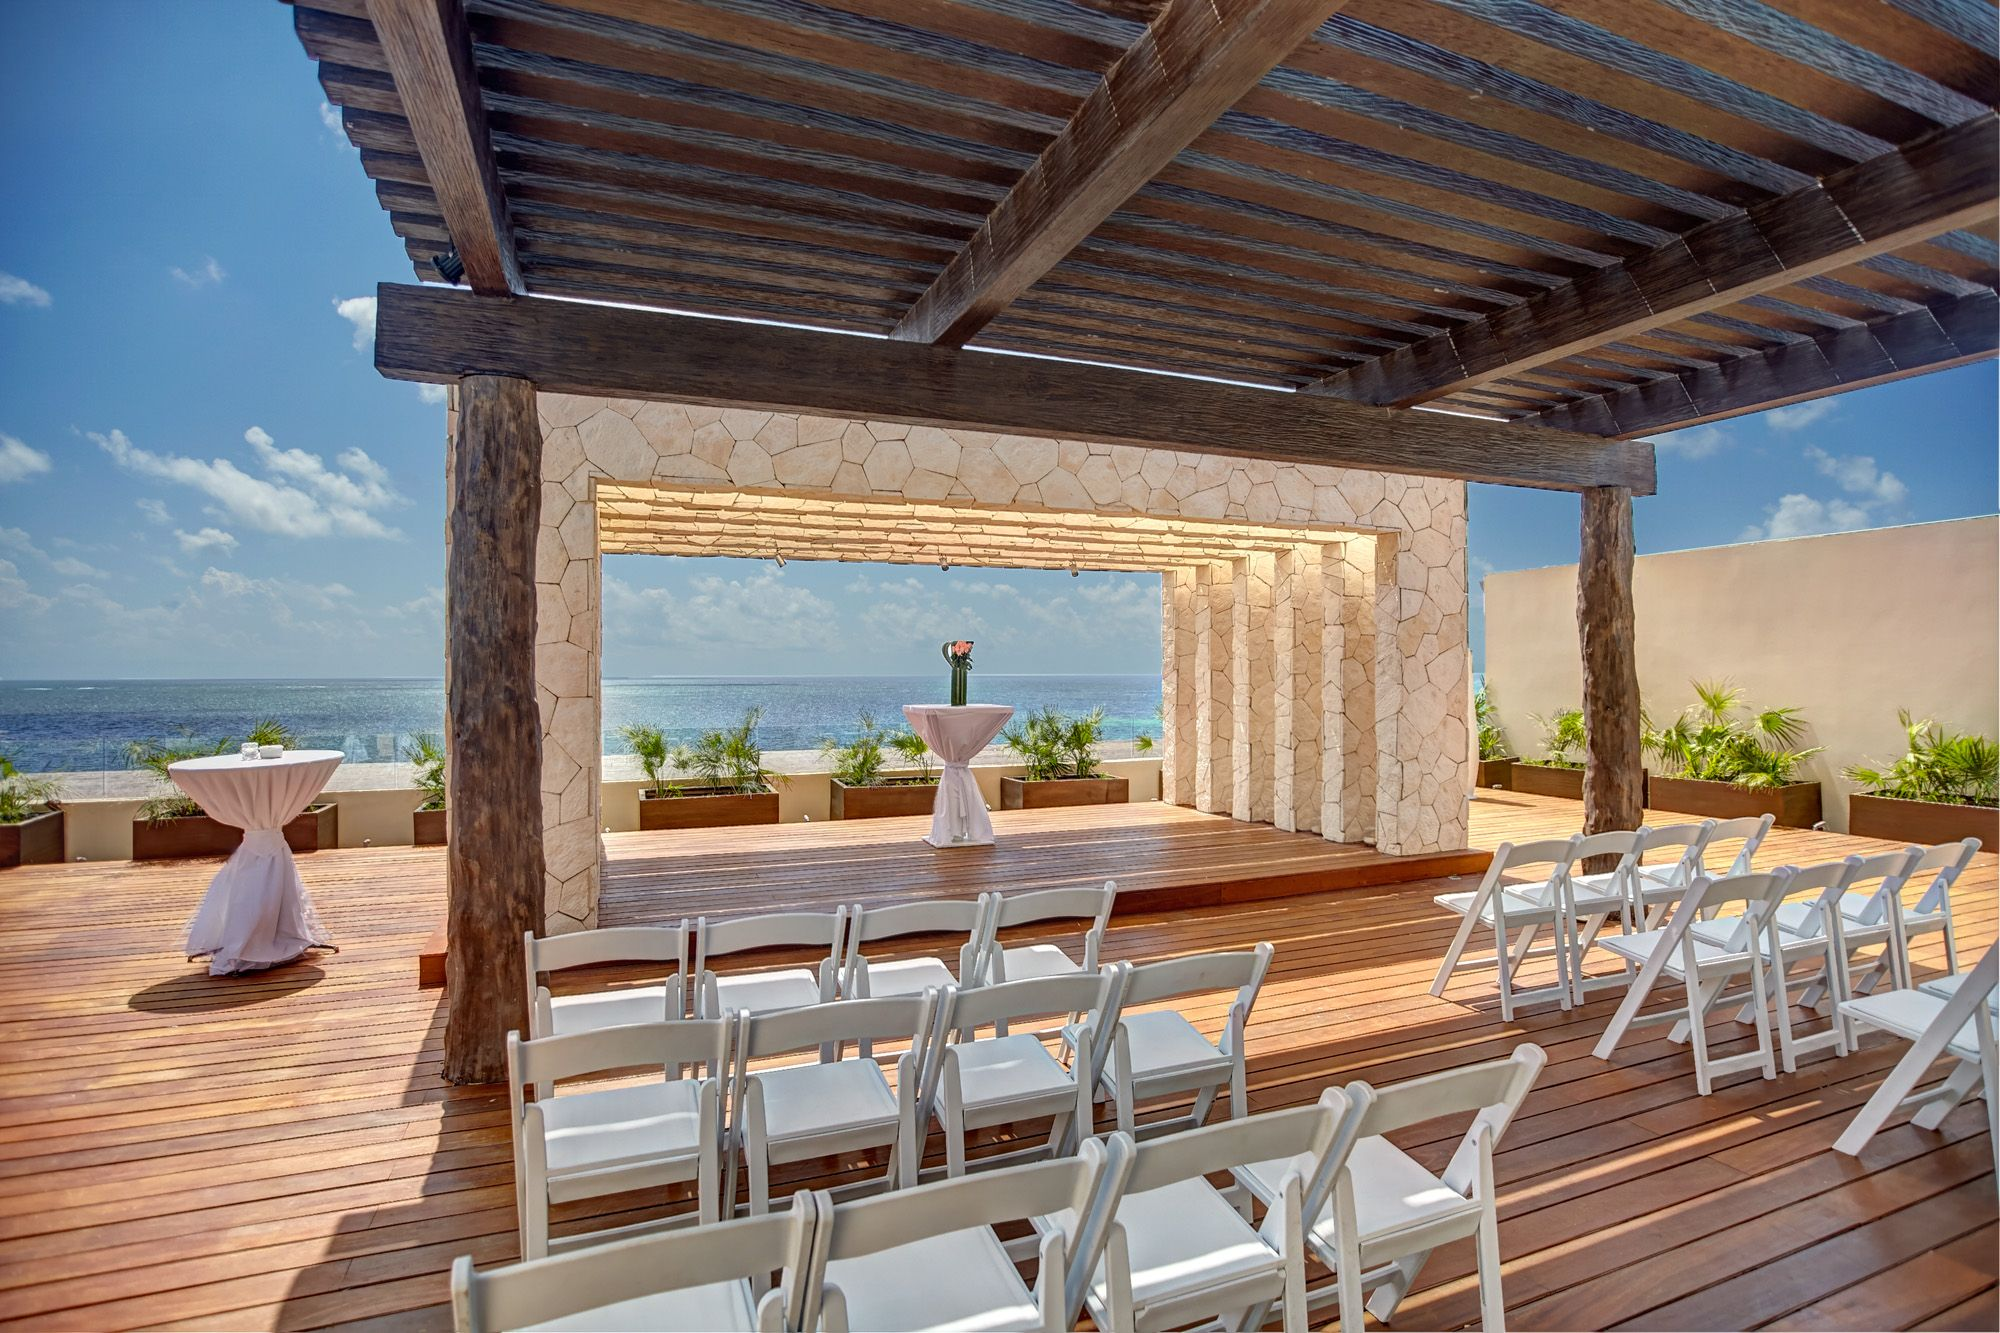 Royalton Riviera Cancun Sky Terrace Wedding (Hideaway section), photo courtesy of Royalton Resorts